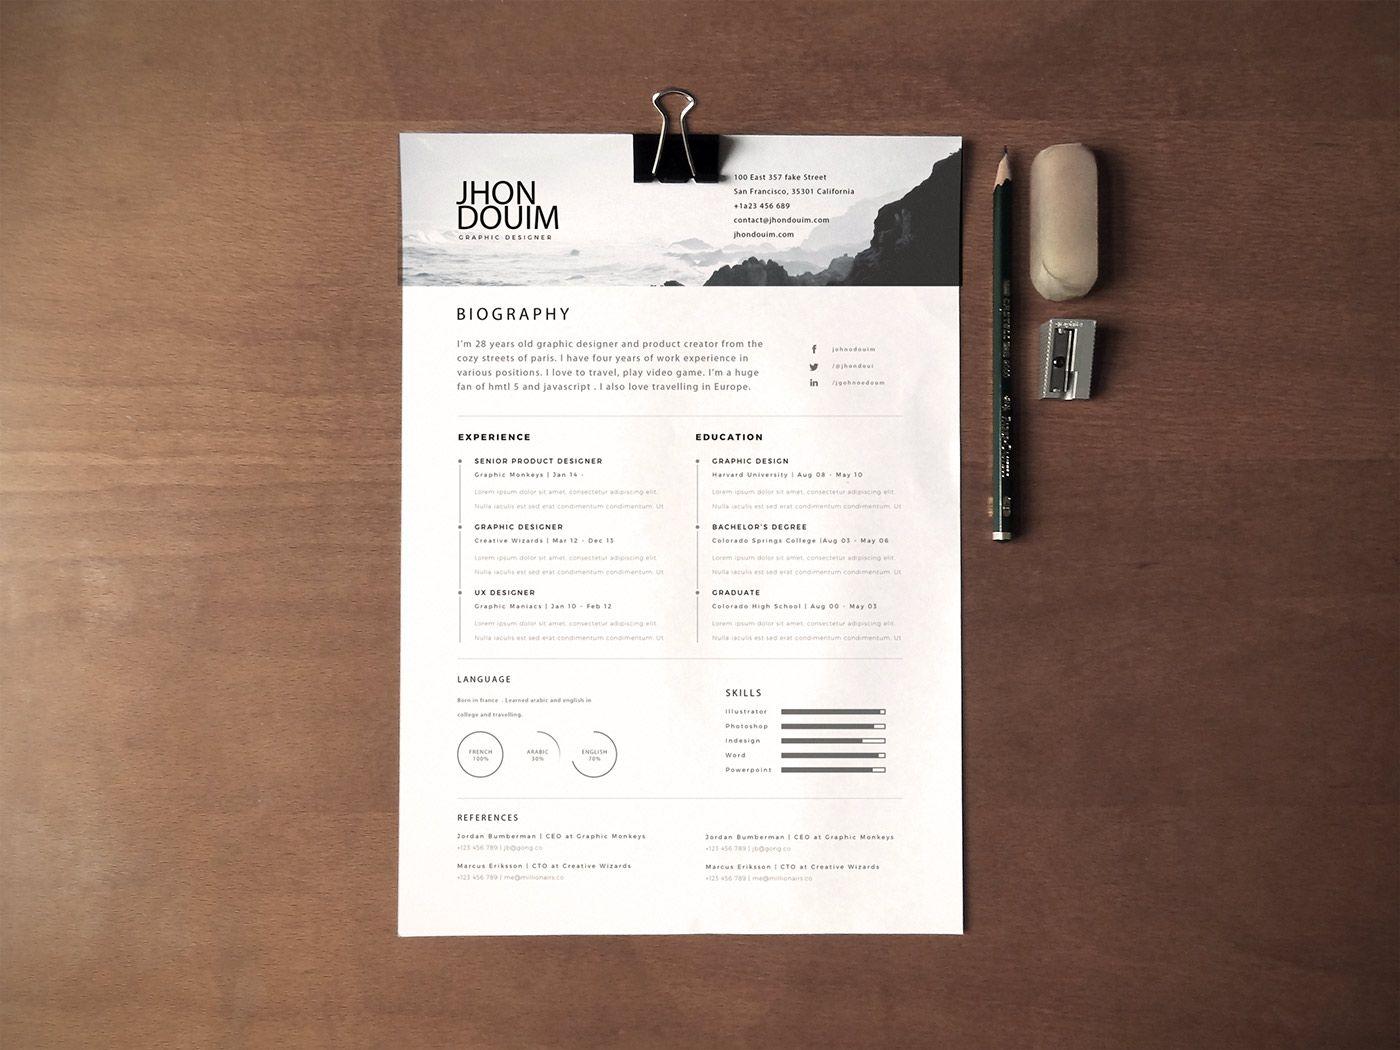 sample resume for light driver example of resume cover letter